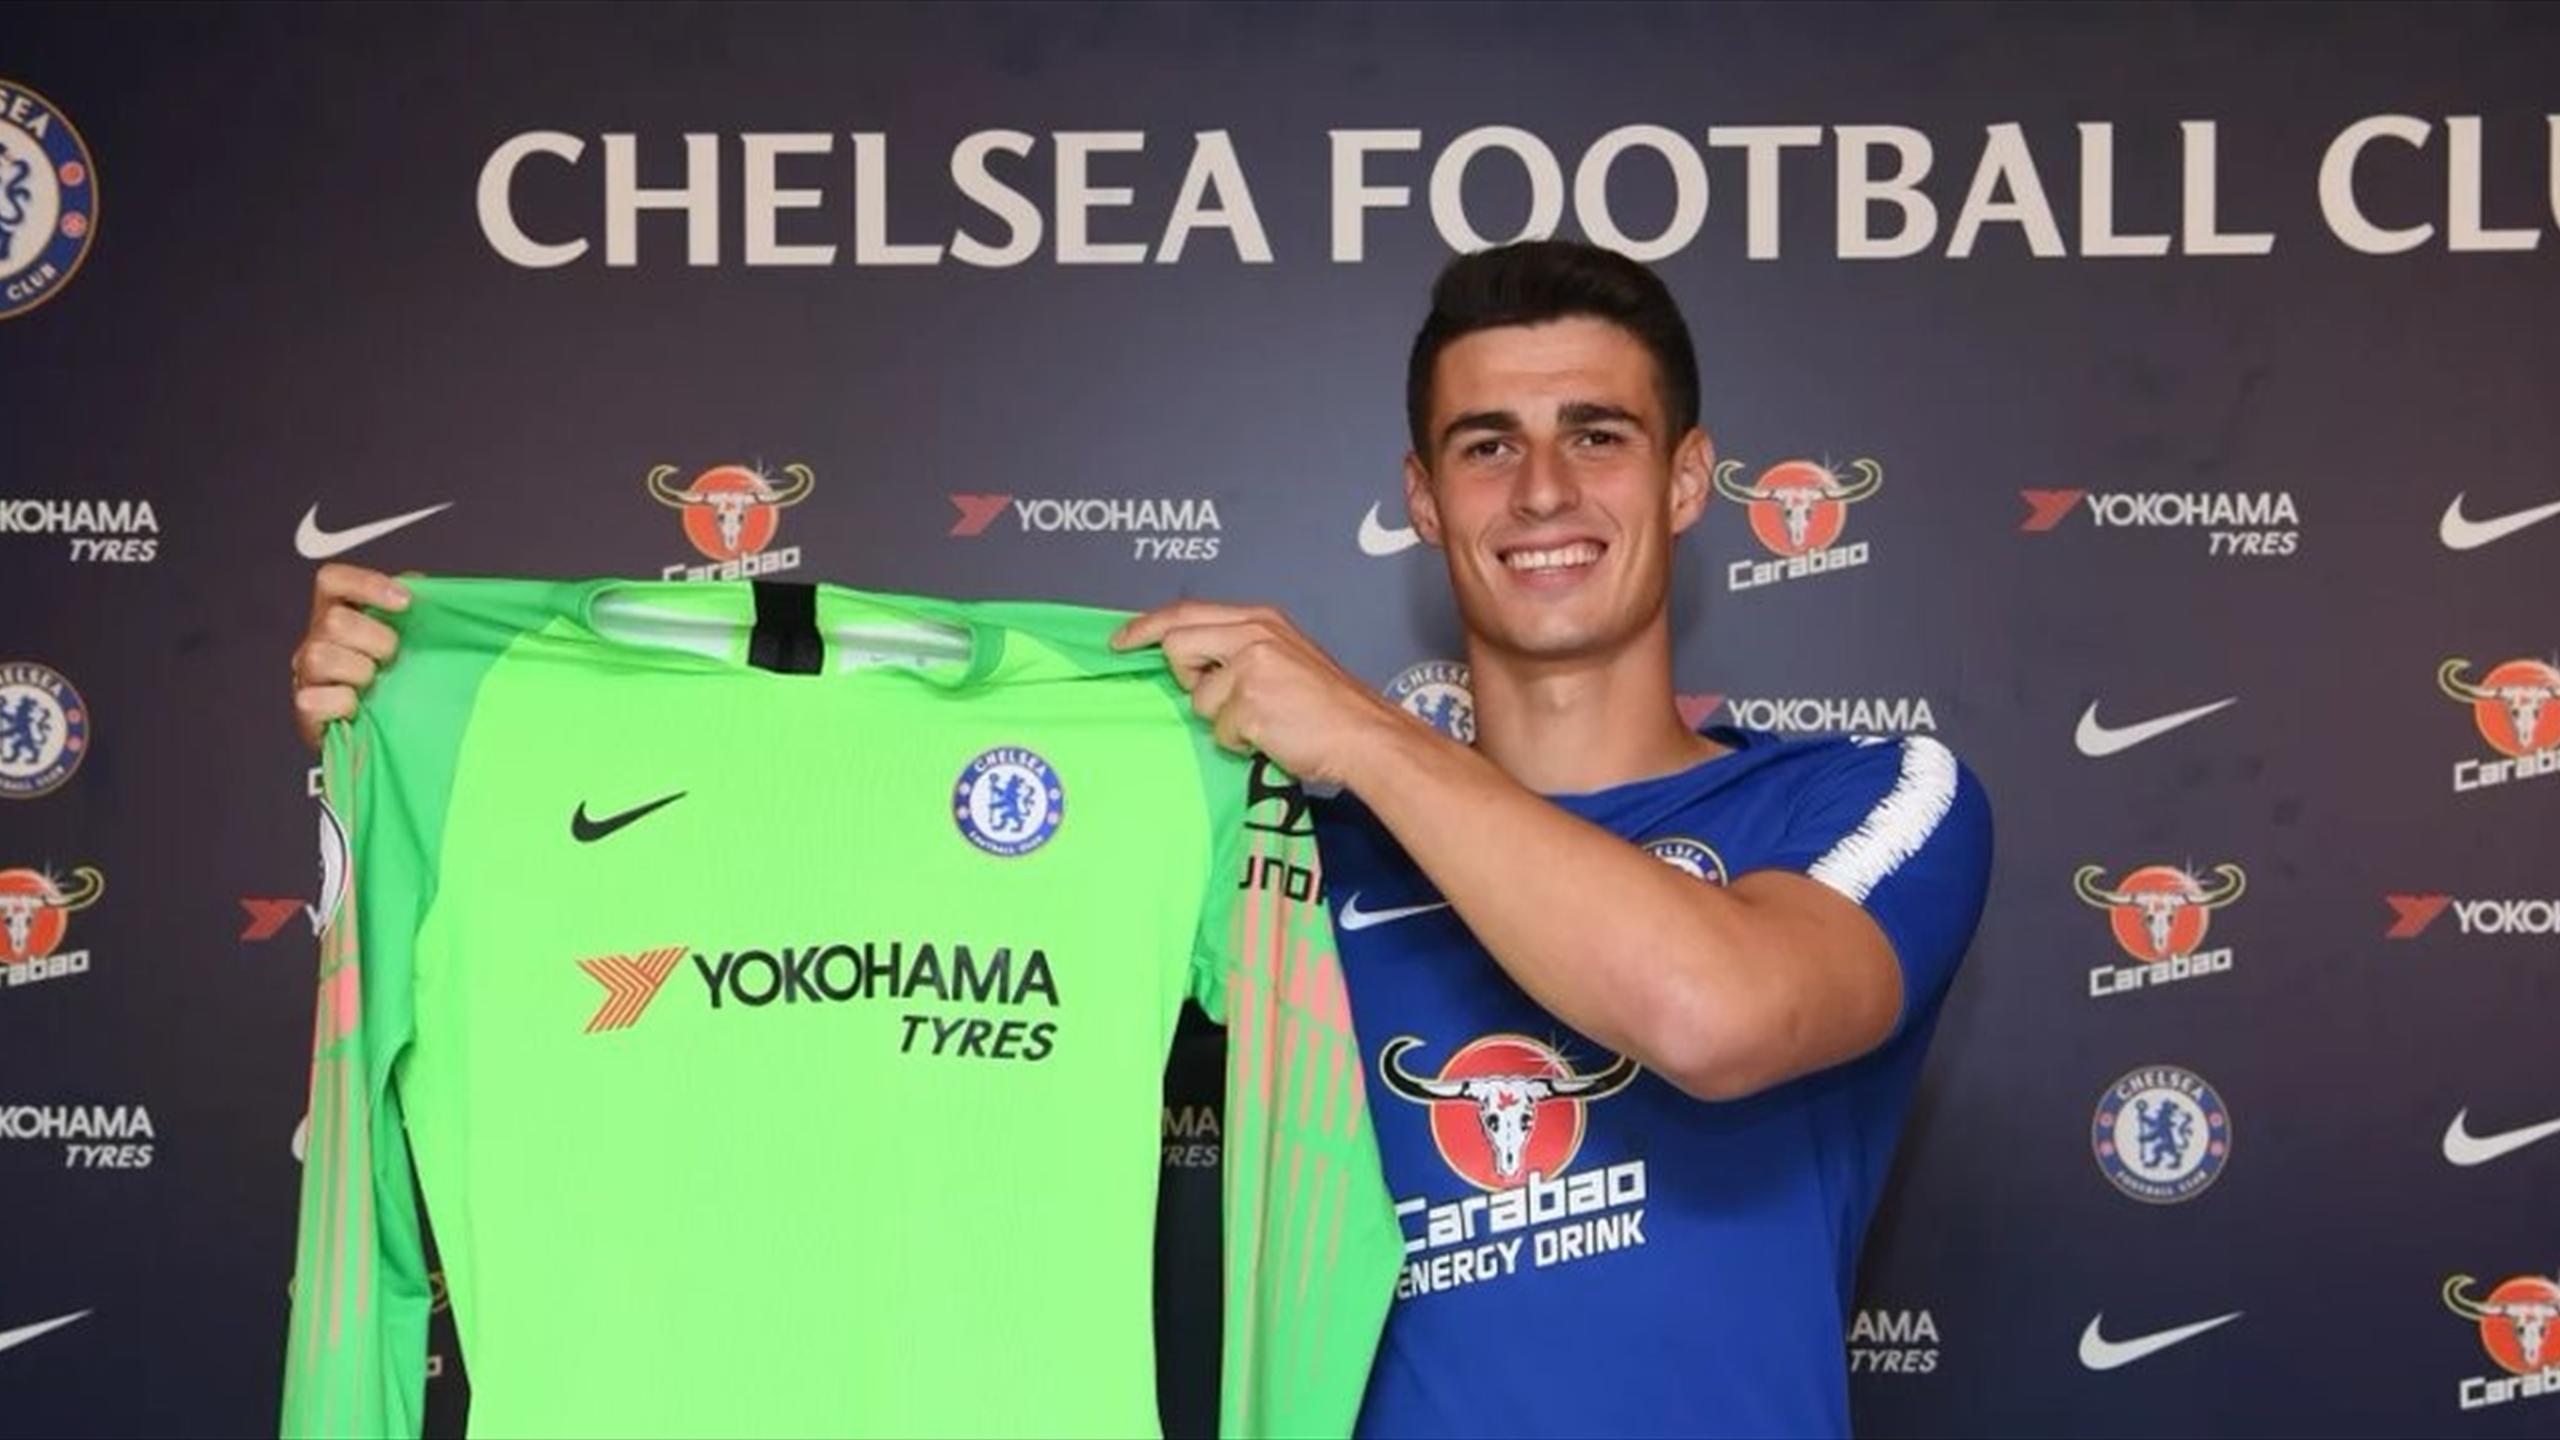 Maglia Home Chelsea Kepa Arrizabalaga